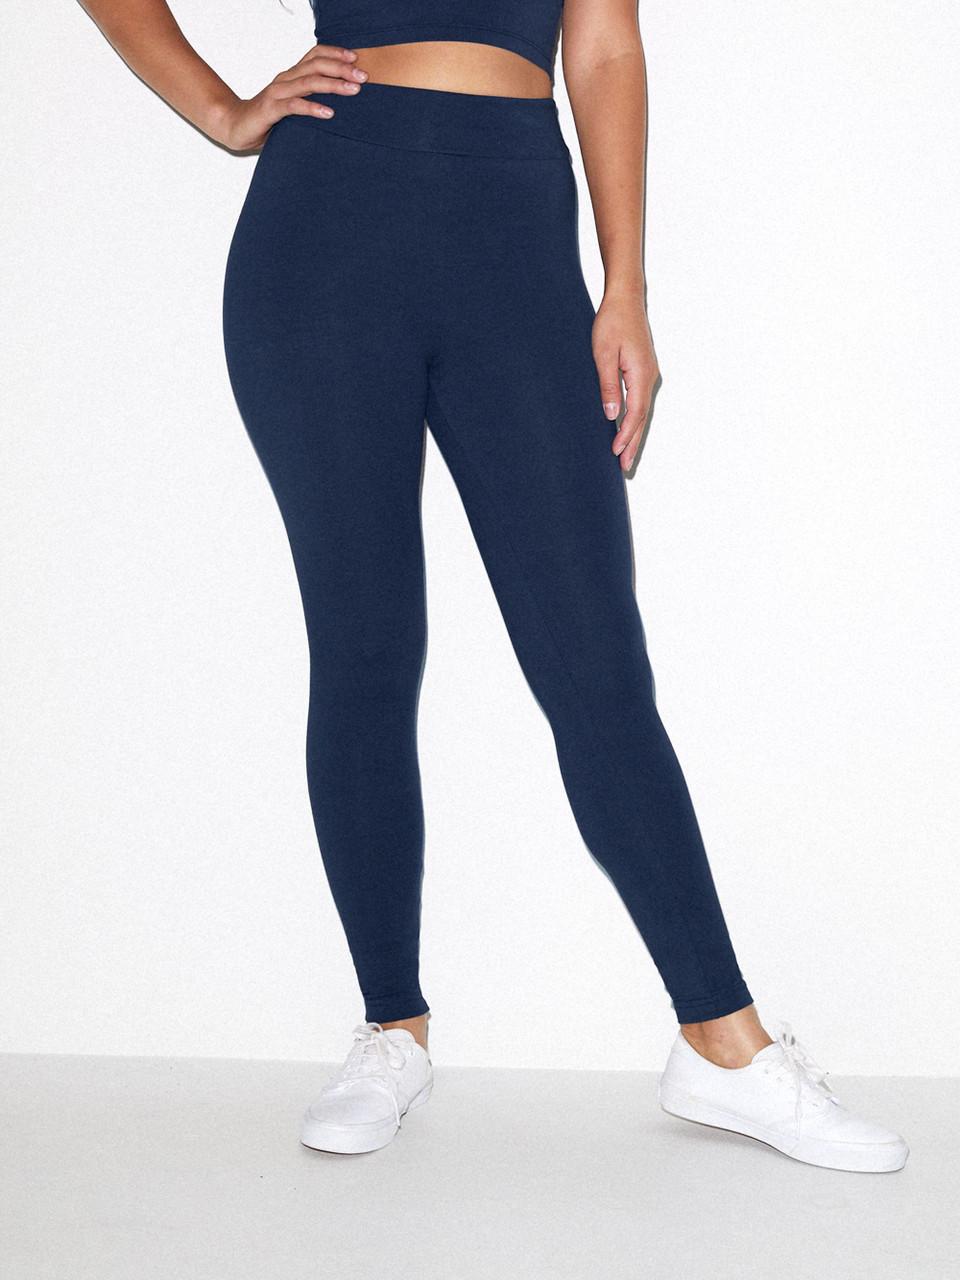 American Apparel Womens Cotton Spandex Jersey High-Waist Leggings